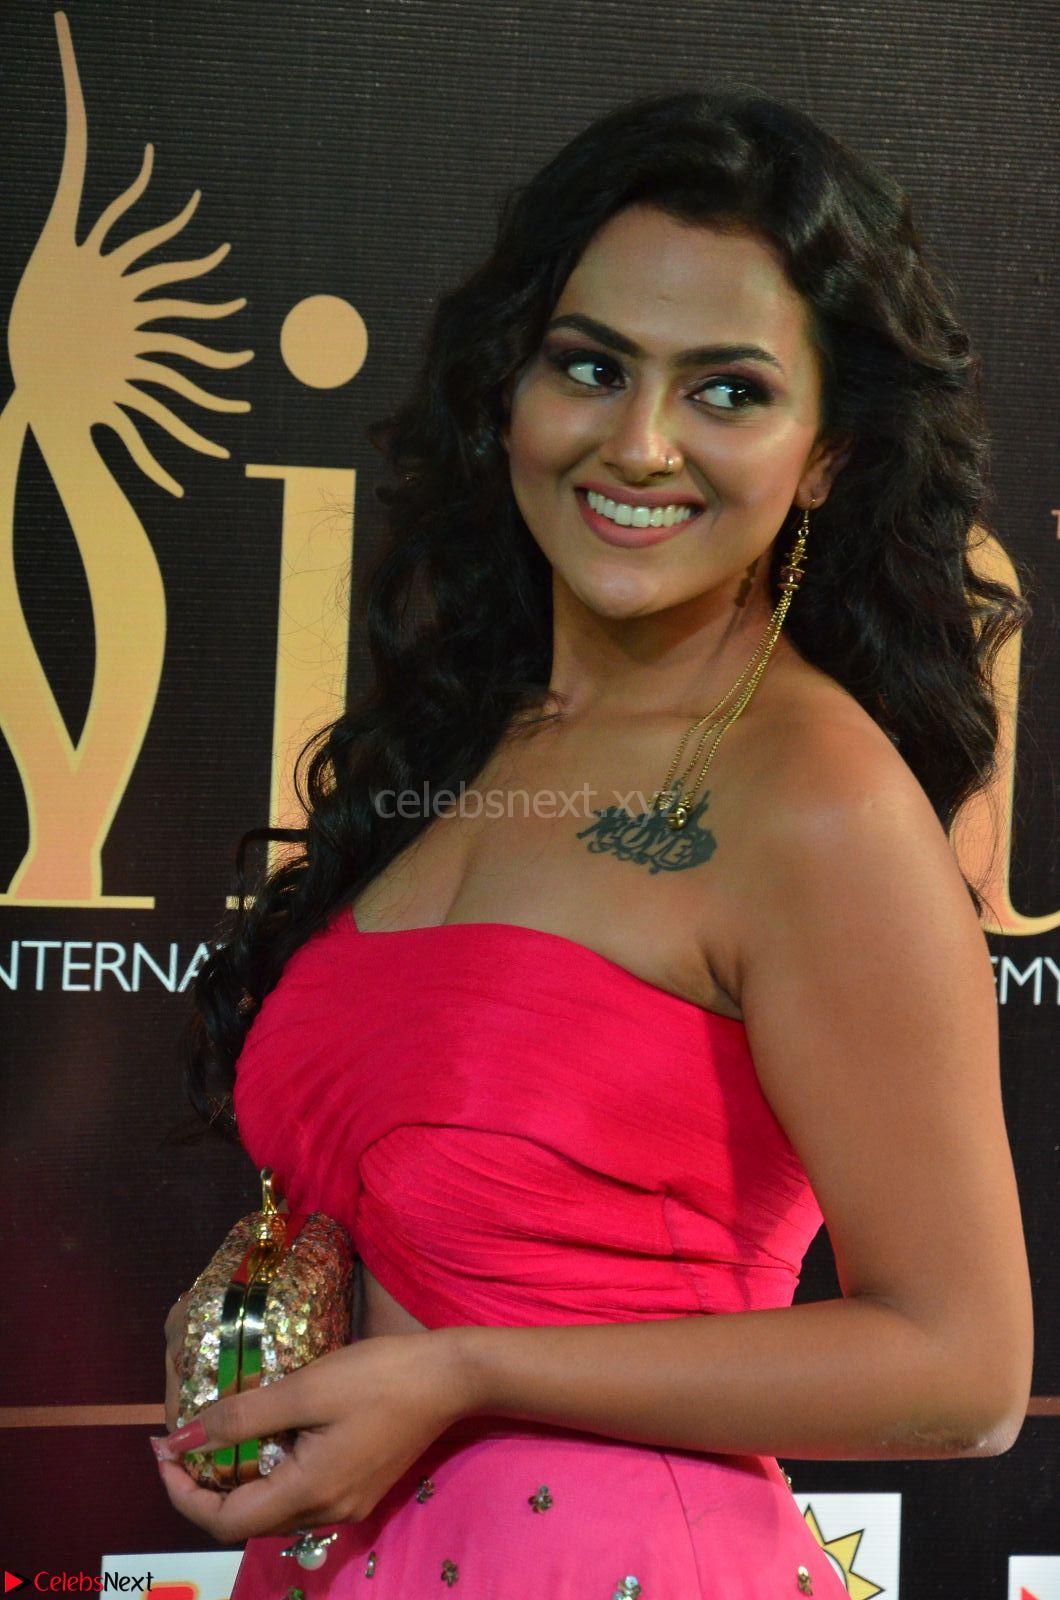 Sraddha in Sleeveless Off Shoulder Pink Dress at IIFA Utsavam Awards March 2017 CelebsNext Exclusive